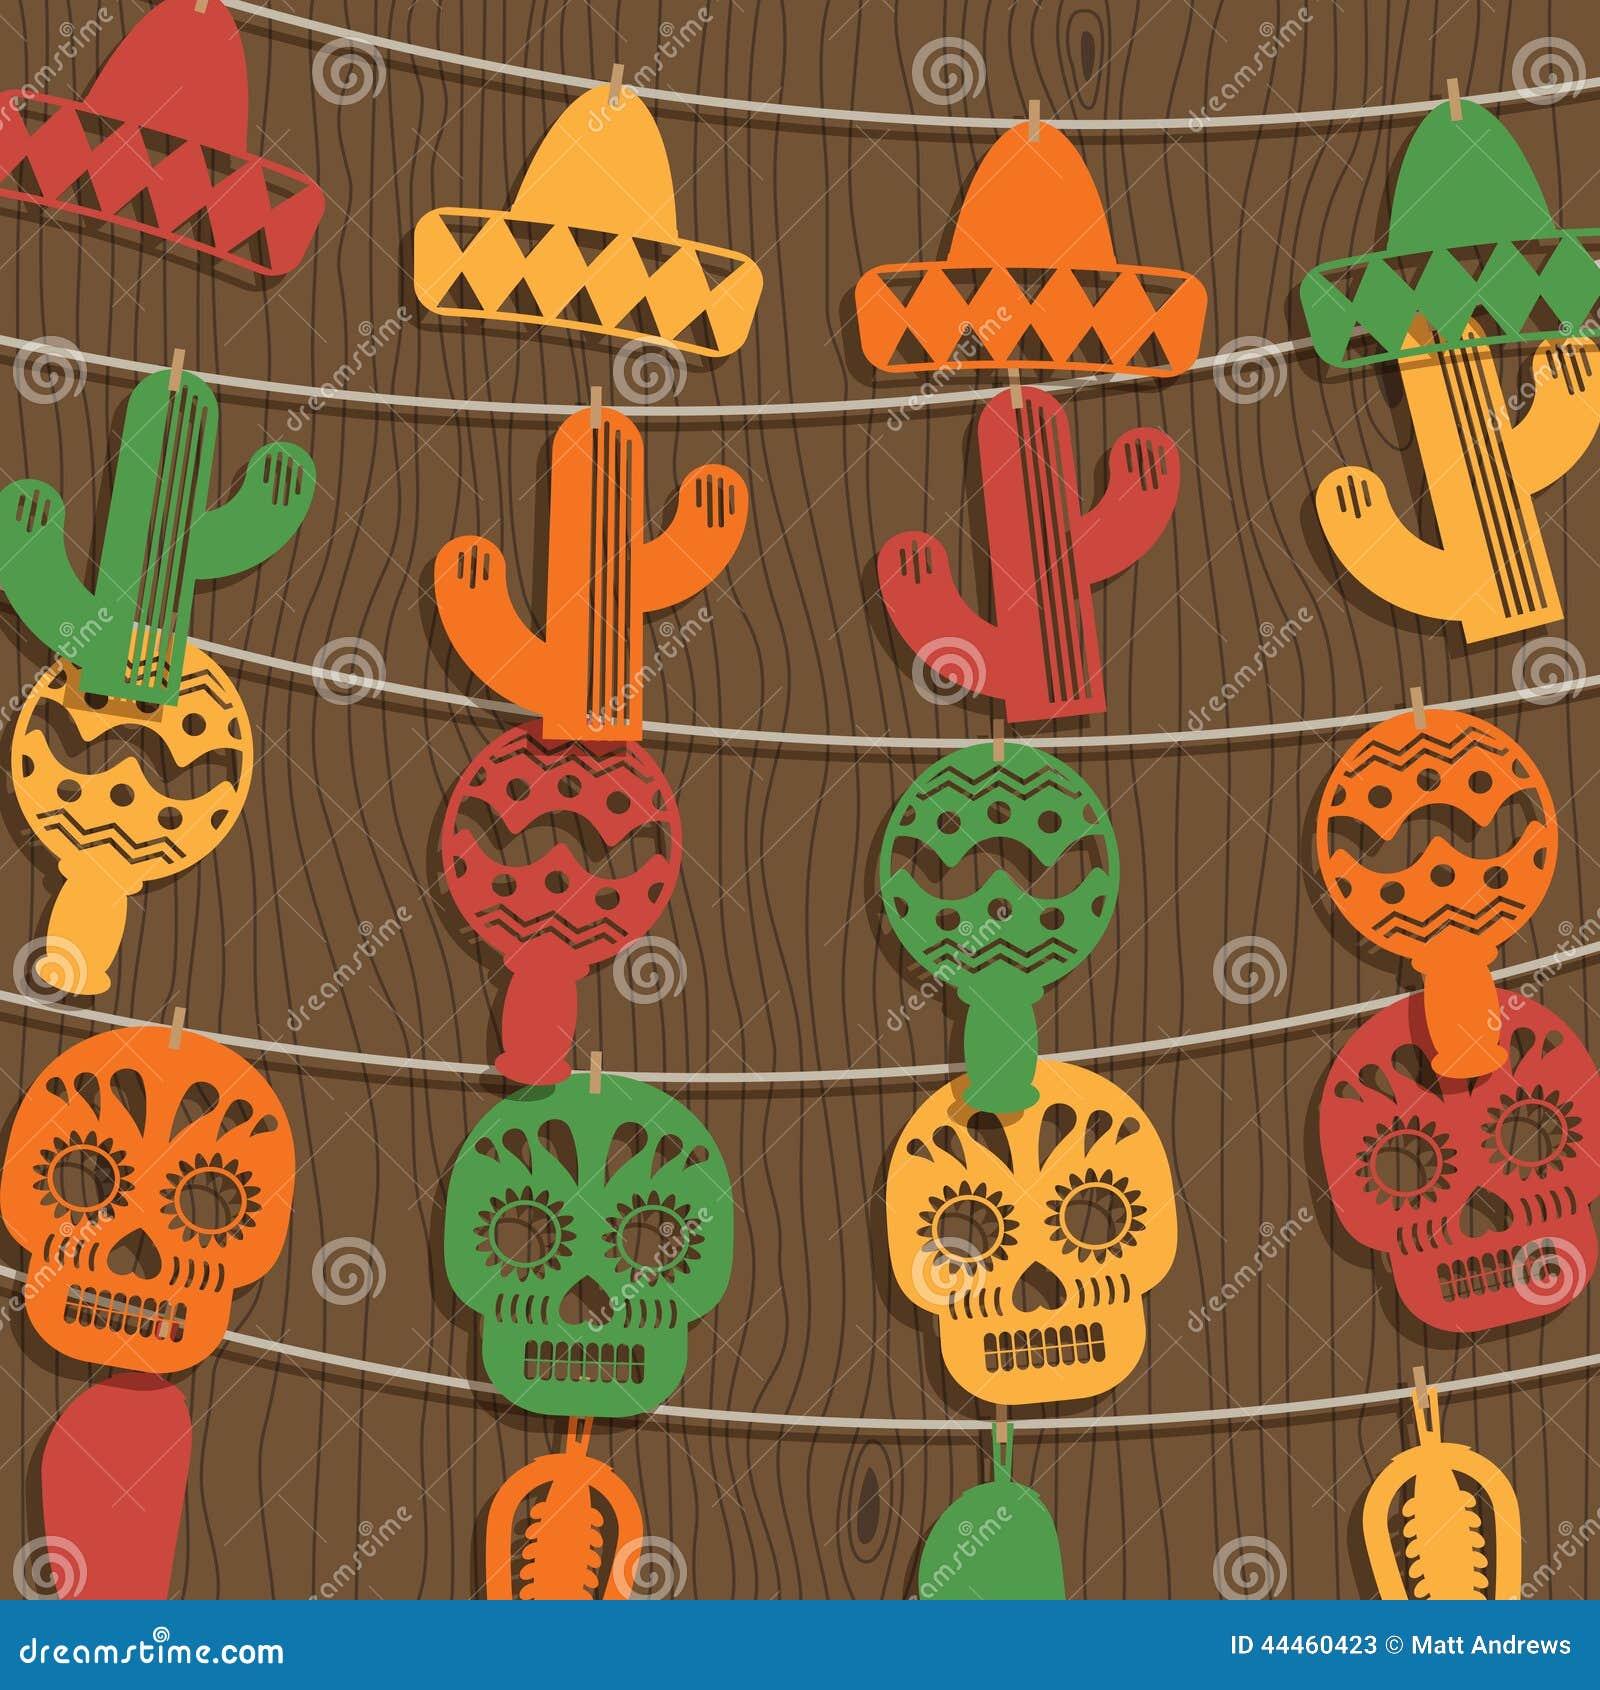 d coration mexicaine d 39 tamine illustration stock illustration du cactus traditionnel 44460423. Black Bedroom Furniture Sets. Home Design Ideas